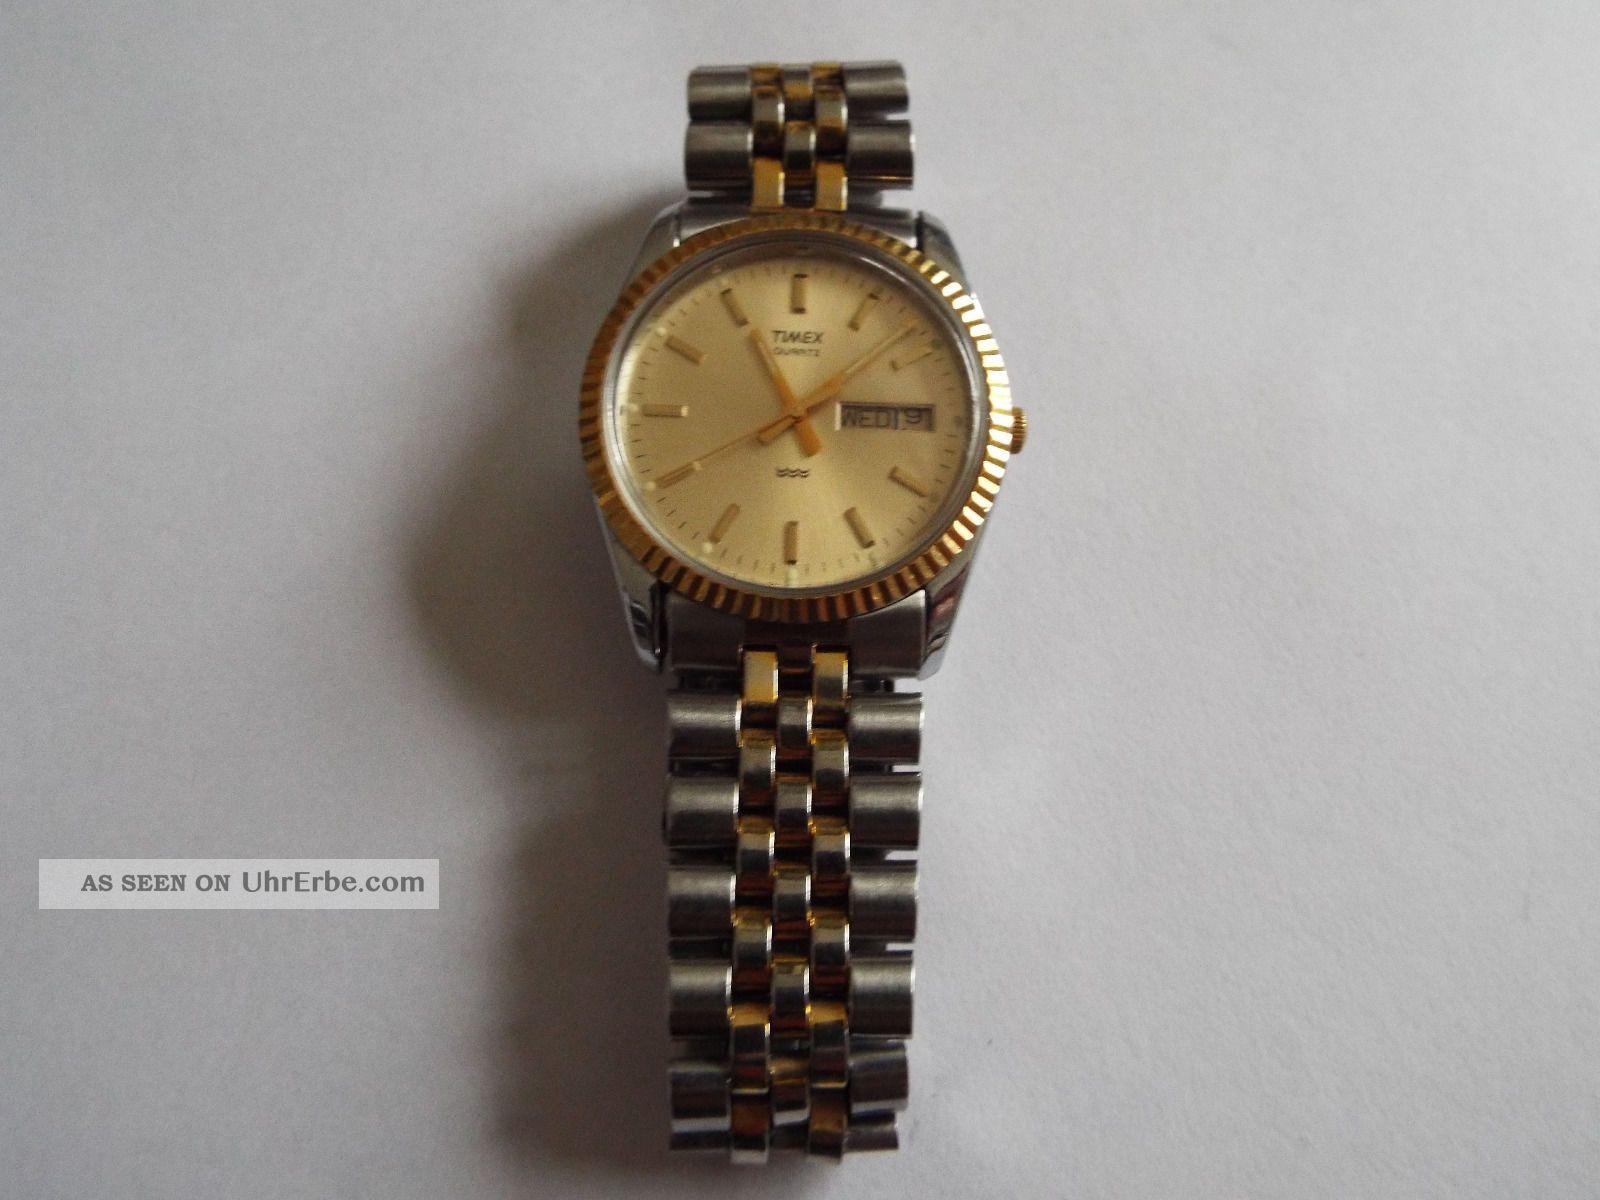 Armbanduhr Timex Quartz 395 La Cell Armbanduhren Bild